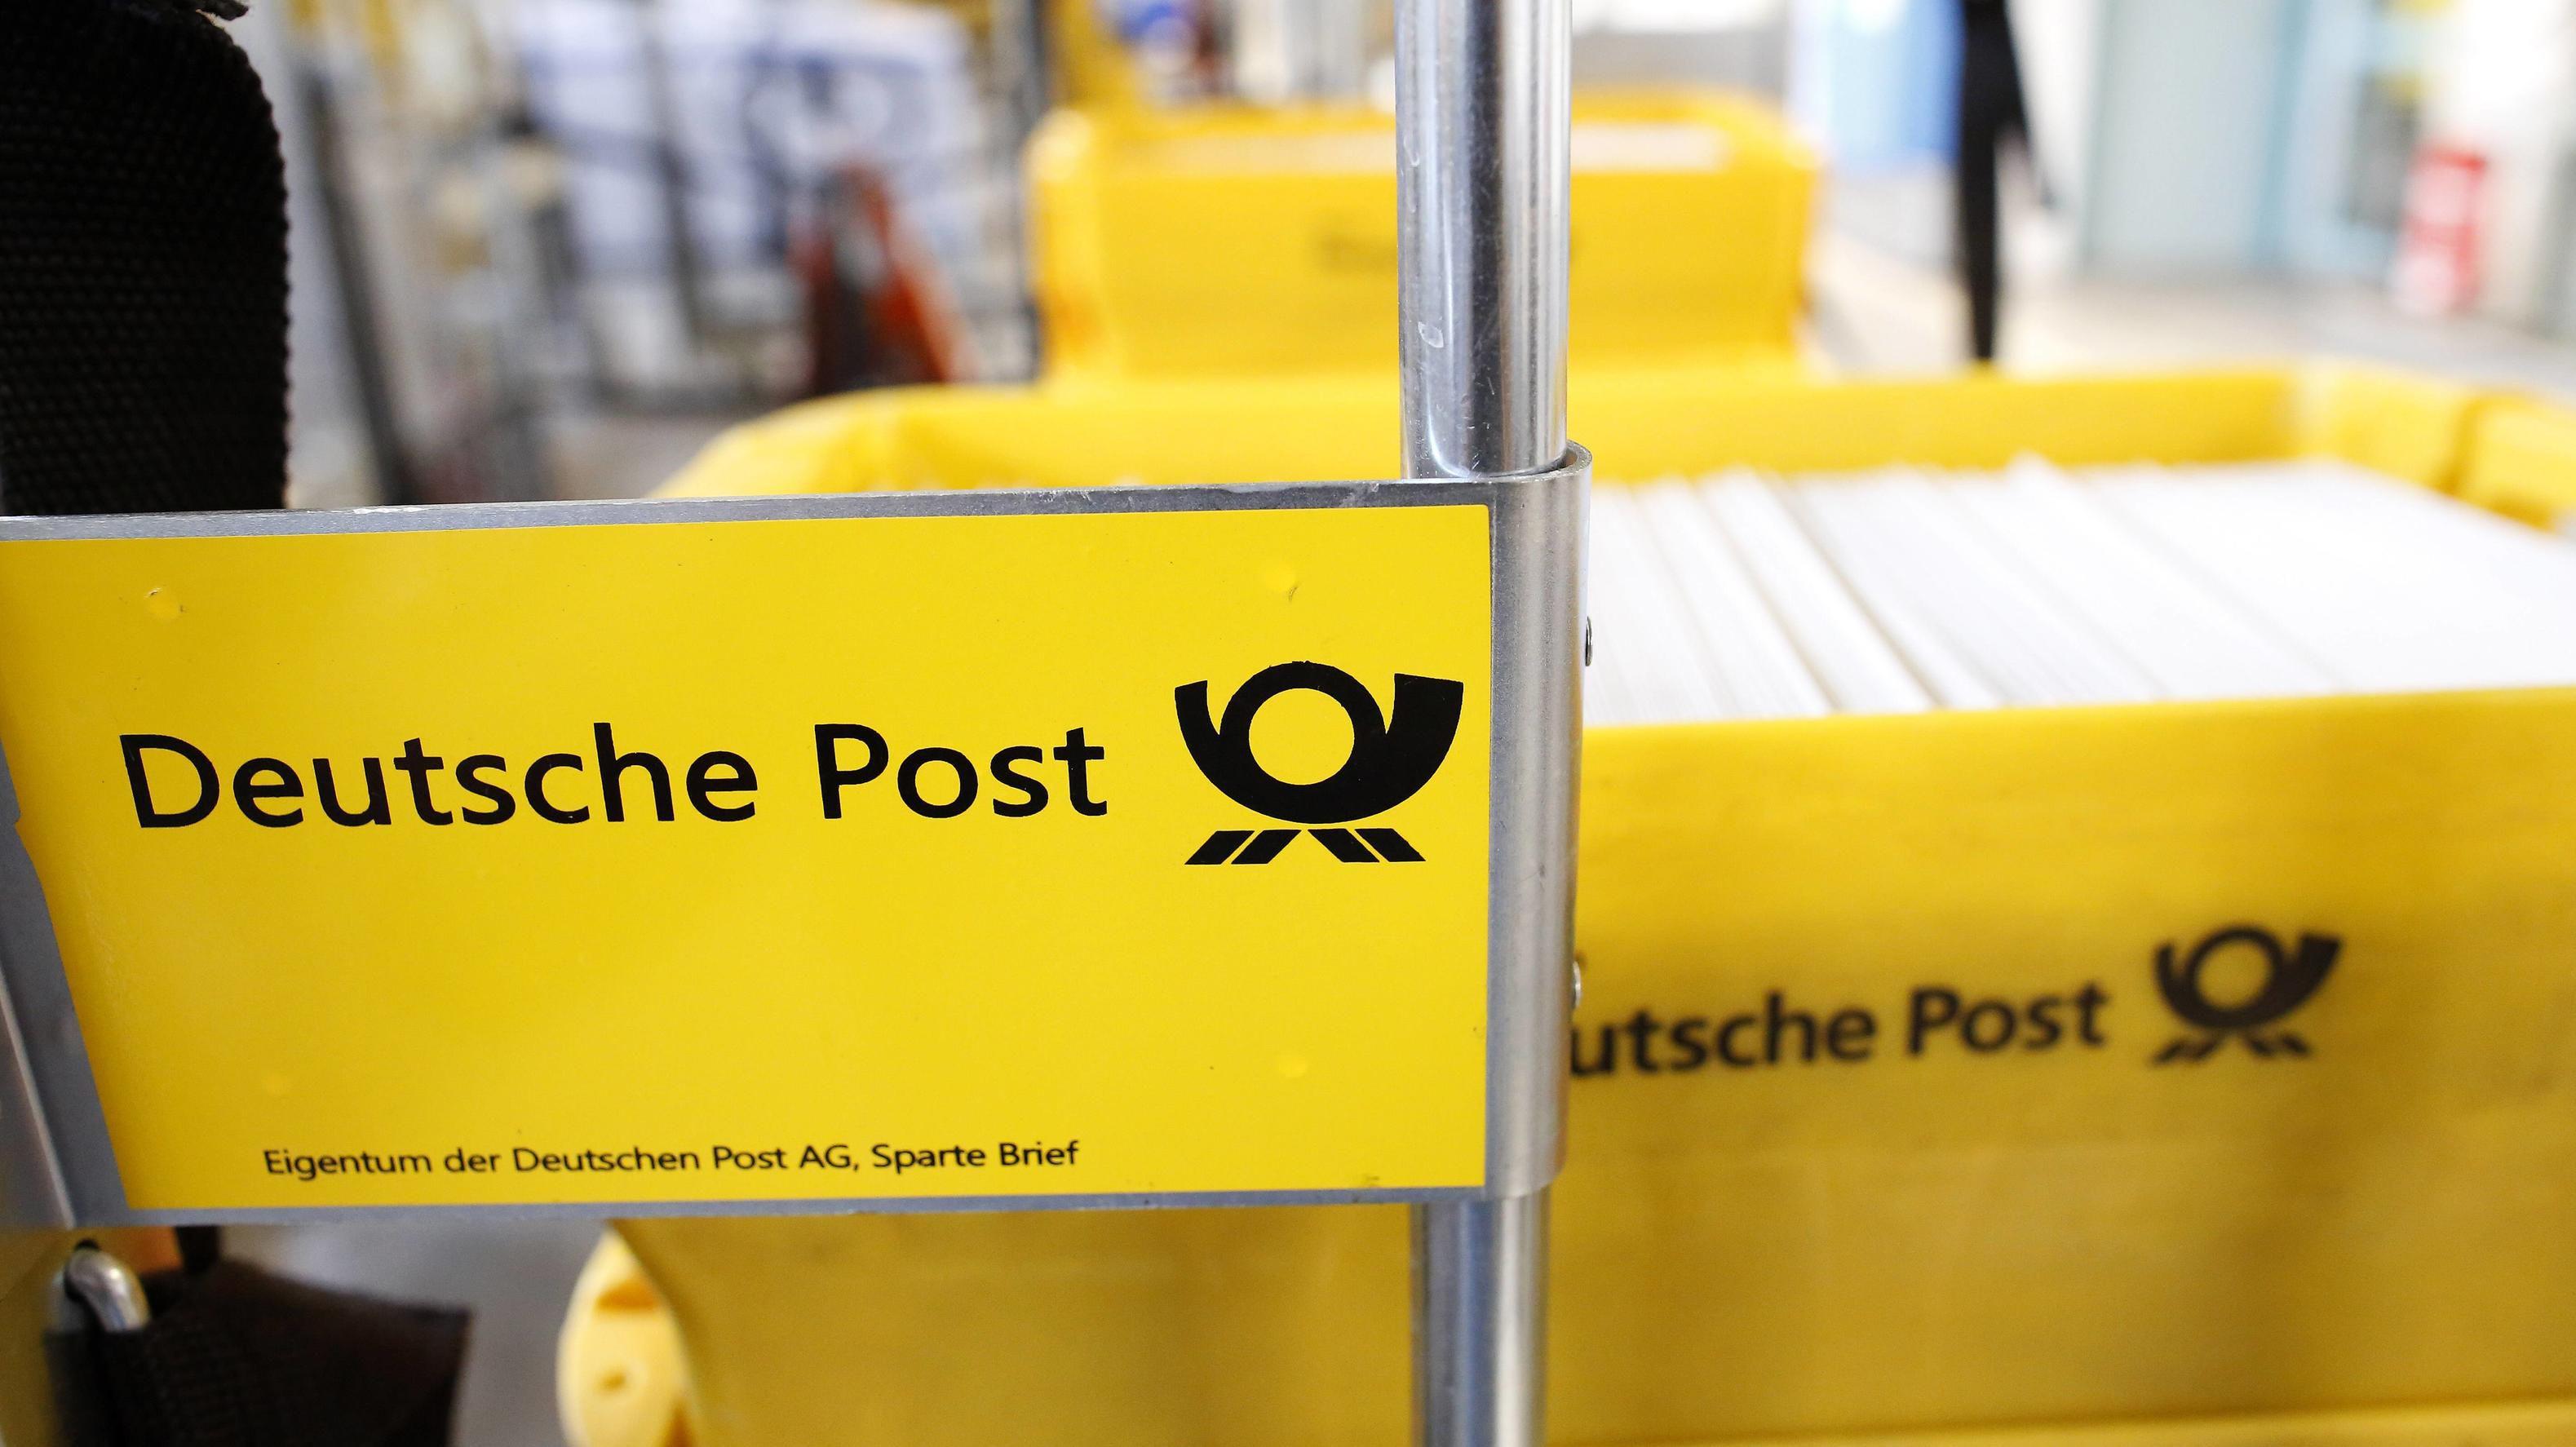 Briefe Bald Wieder Teurer Deutsche Post Soll Portoerhöhung Planen